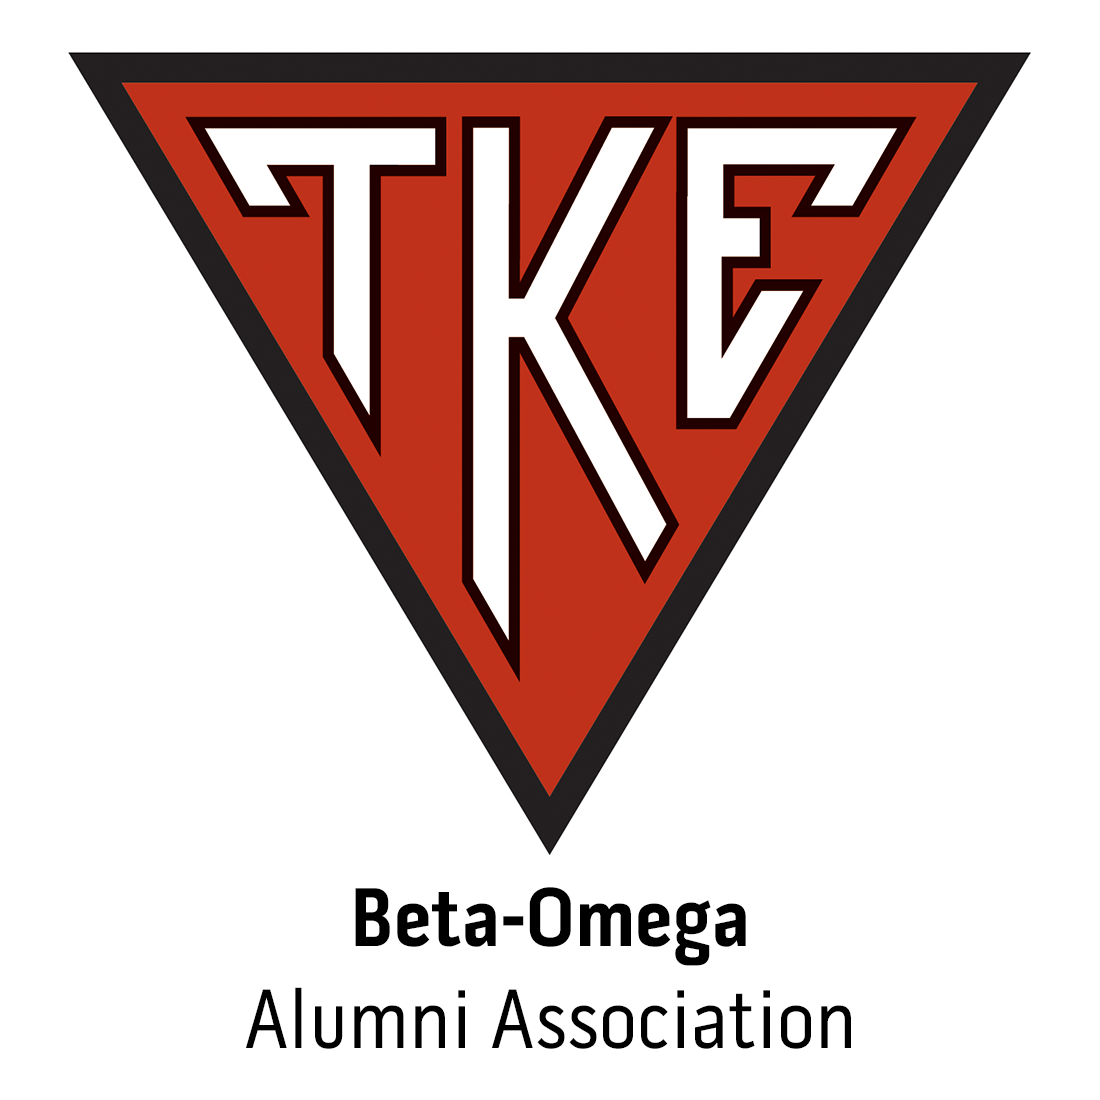 Beta-Omega Alumni Association for Missouri State University